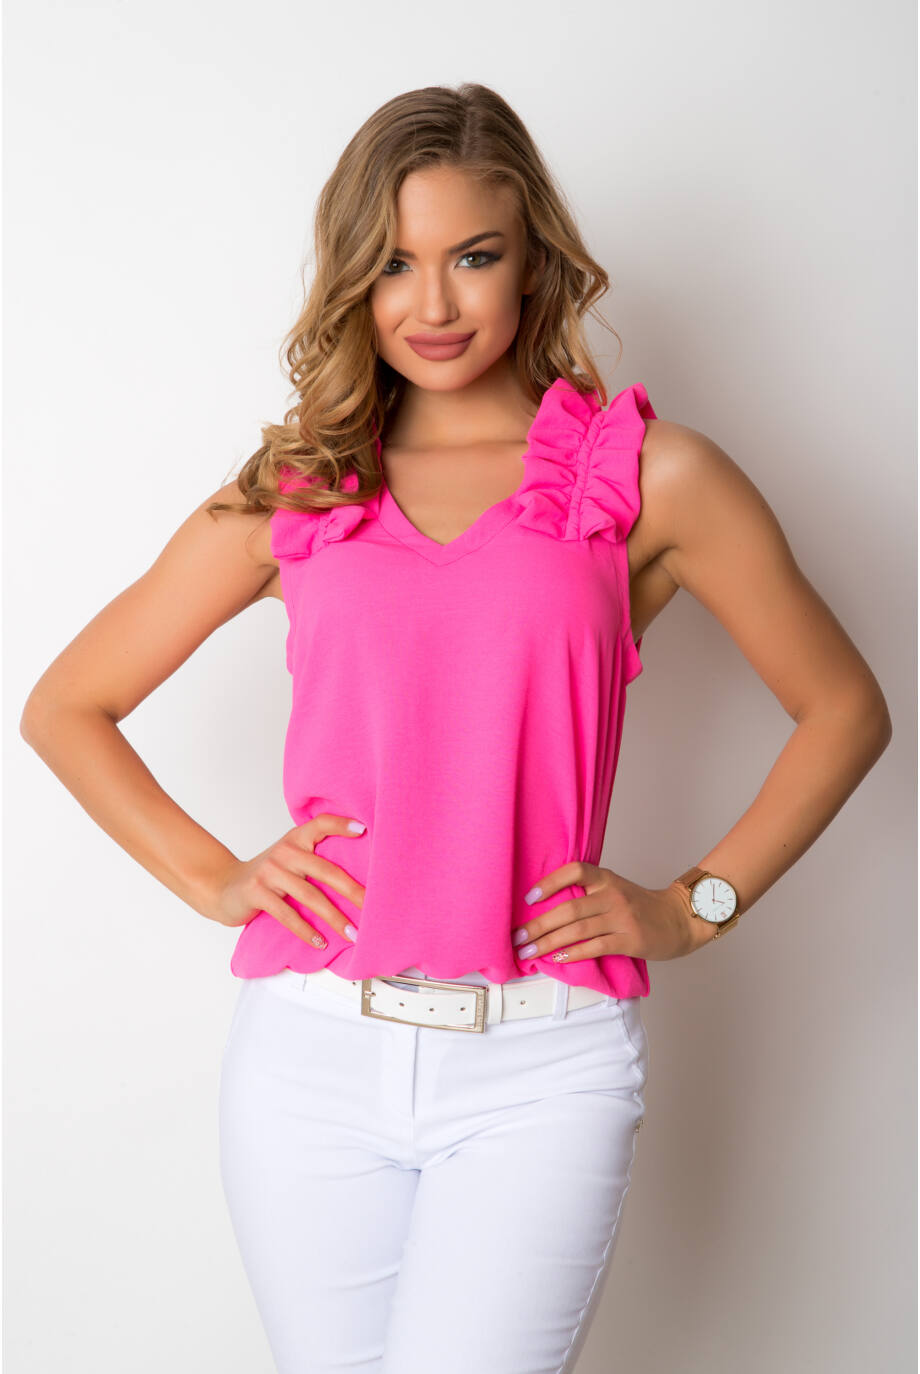 vallan_fodros_felso_sandy_menta_pink_blue_nature